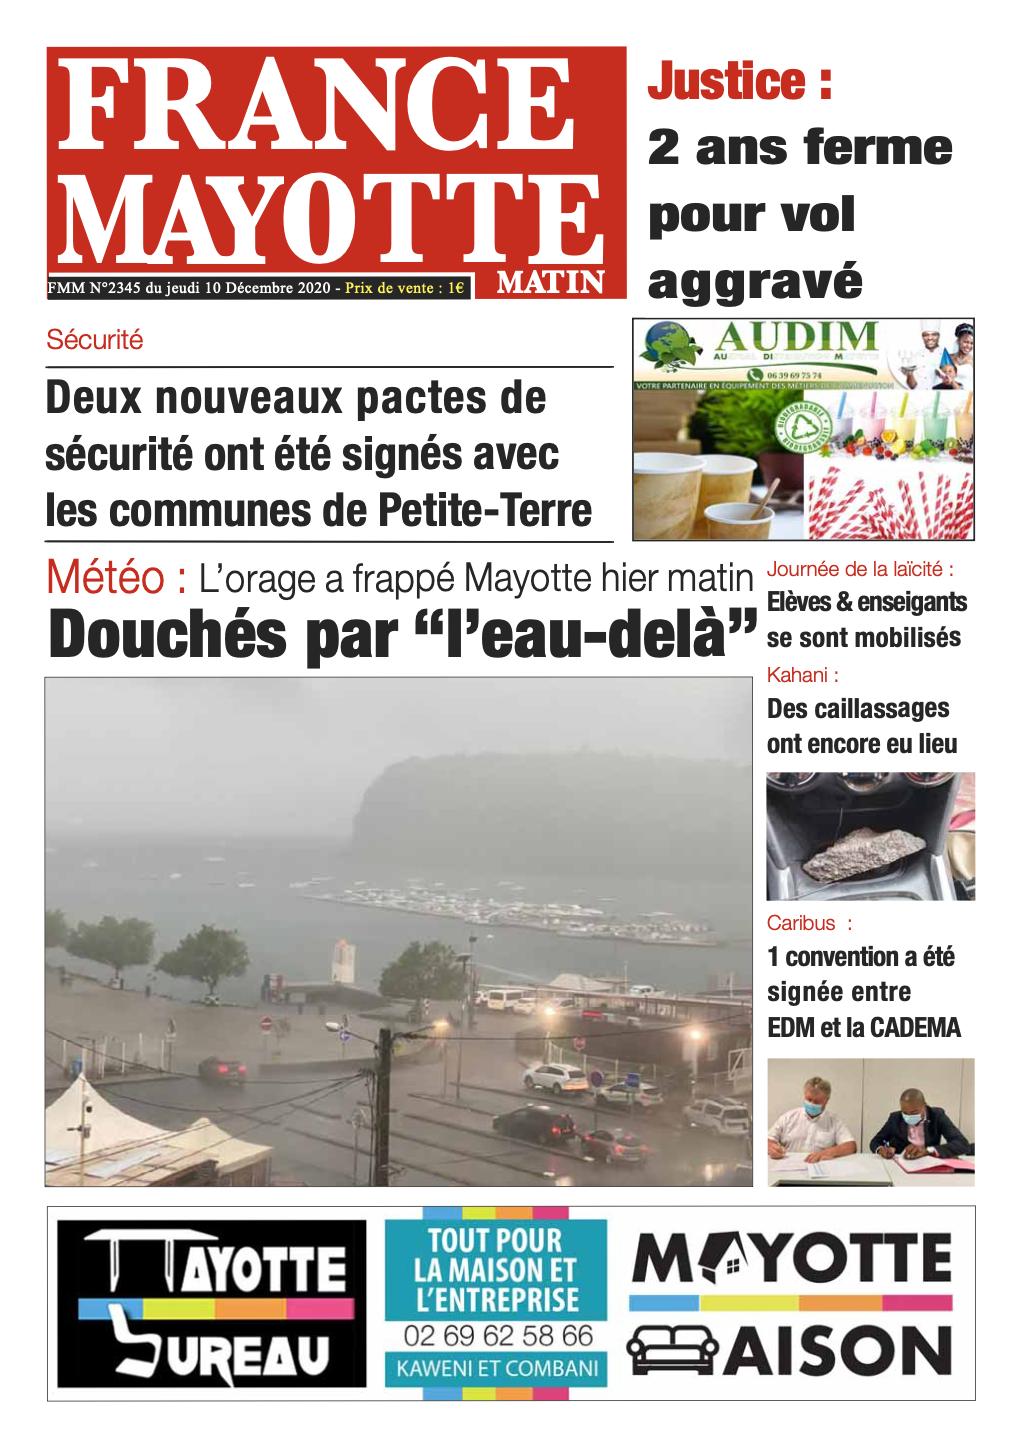 France Mayotte Jeudi 10 décembre 2020